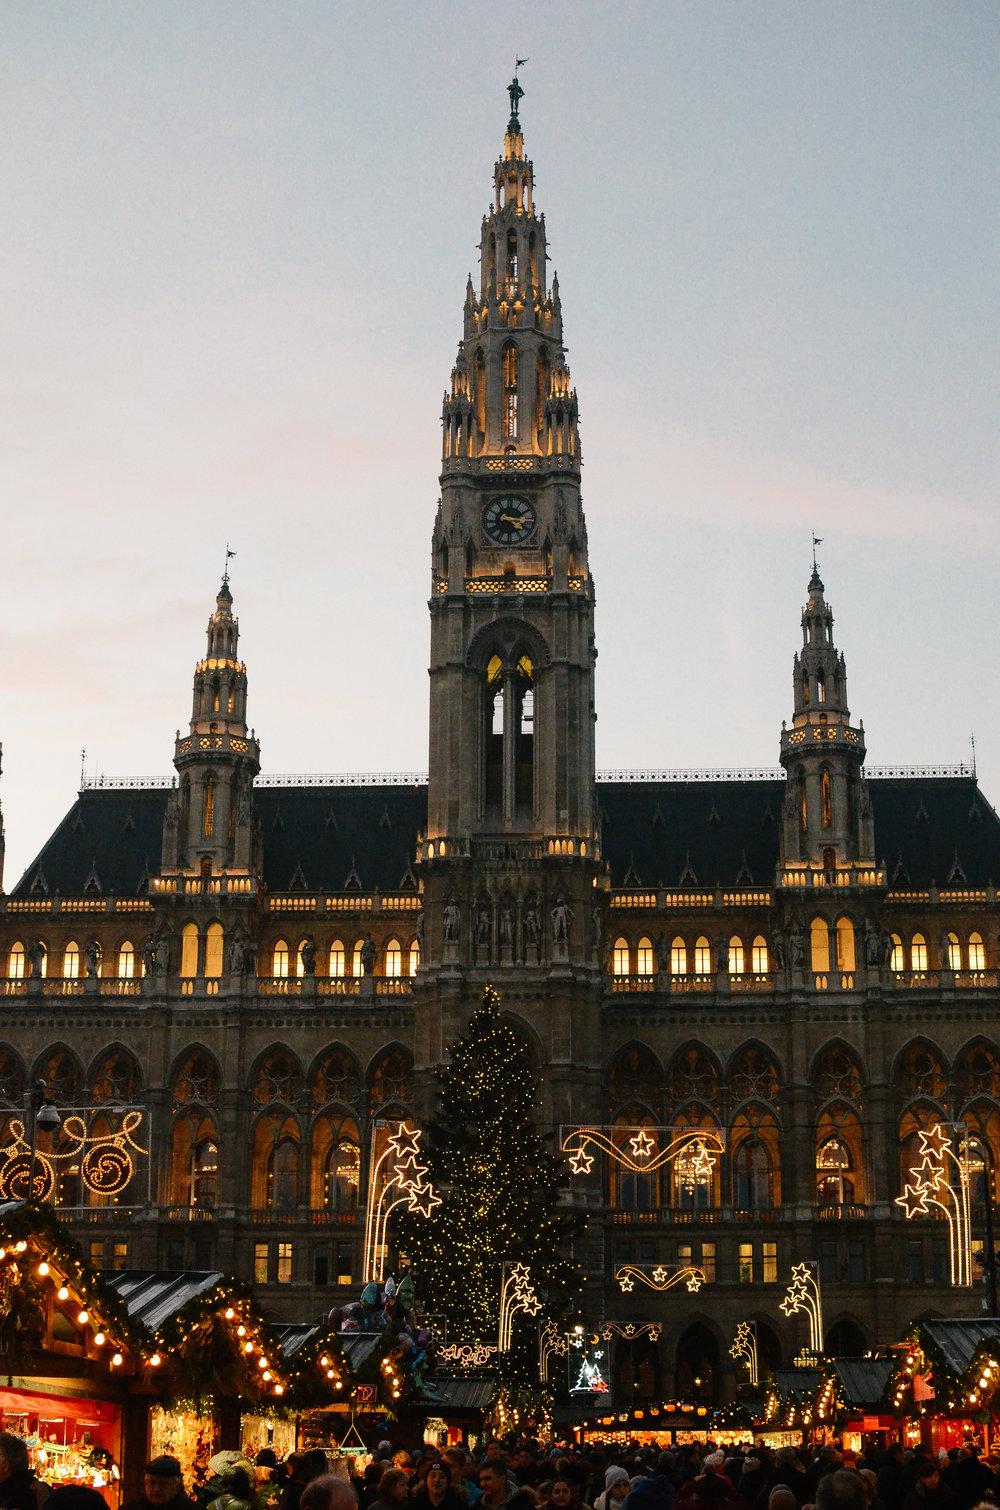 european-christmas-market-travel-guide-lifeonpine_DSC_1499.jpg